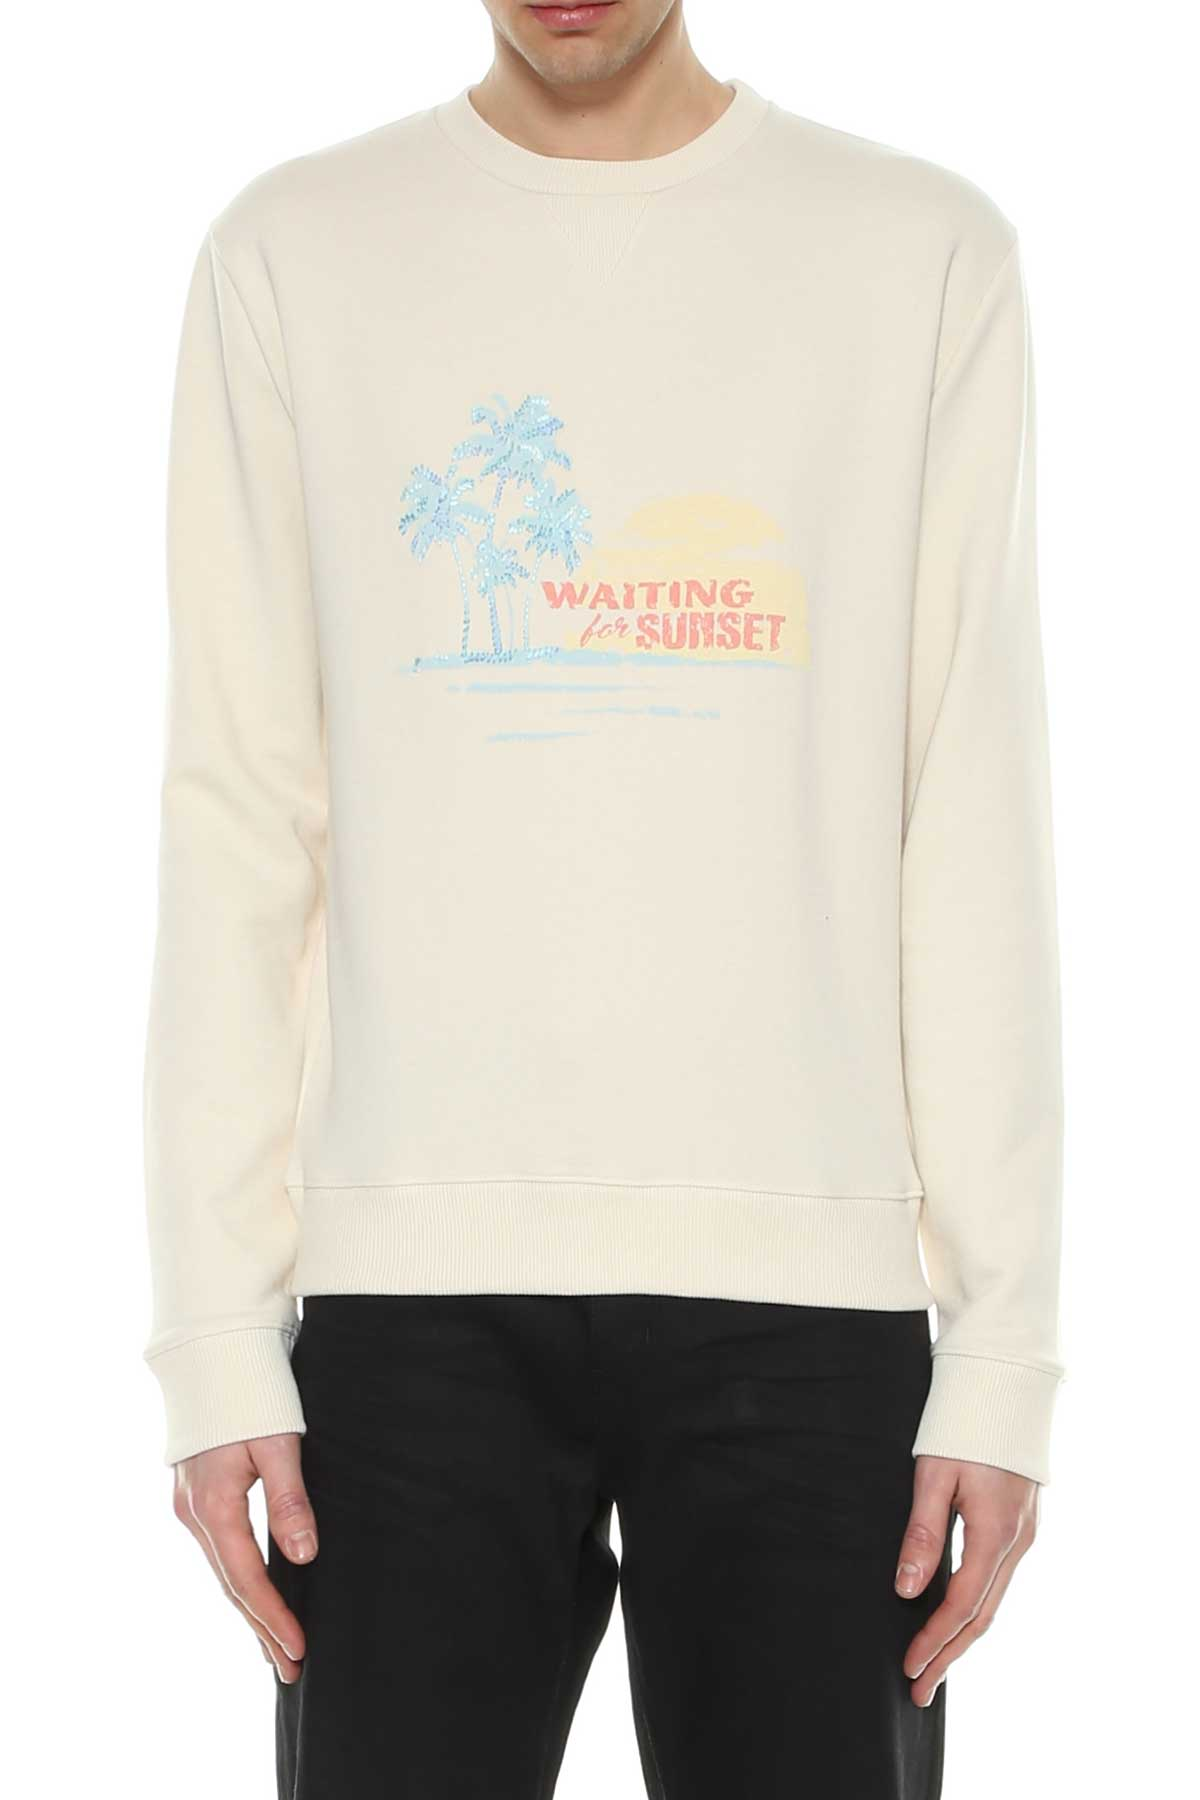 Saint Laurent Saint Laurent Sweatshirt Waiting For Summer Embroidery